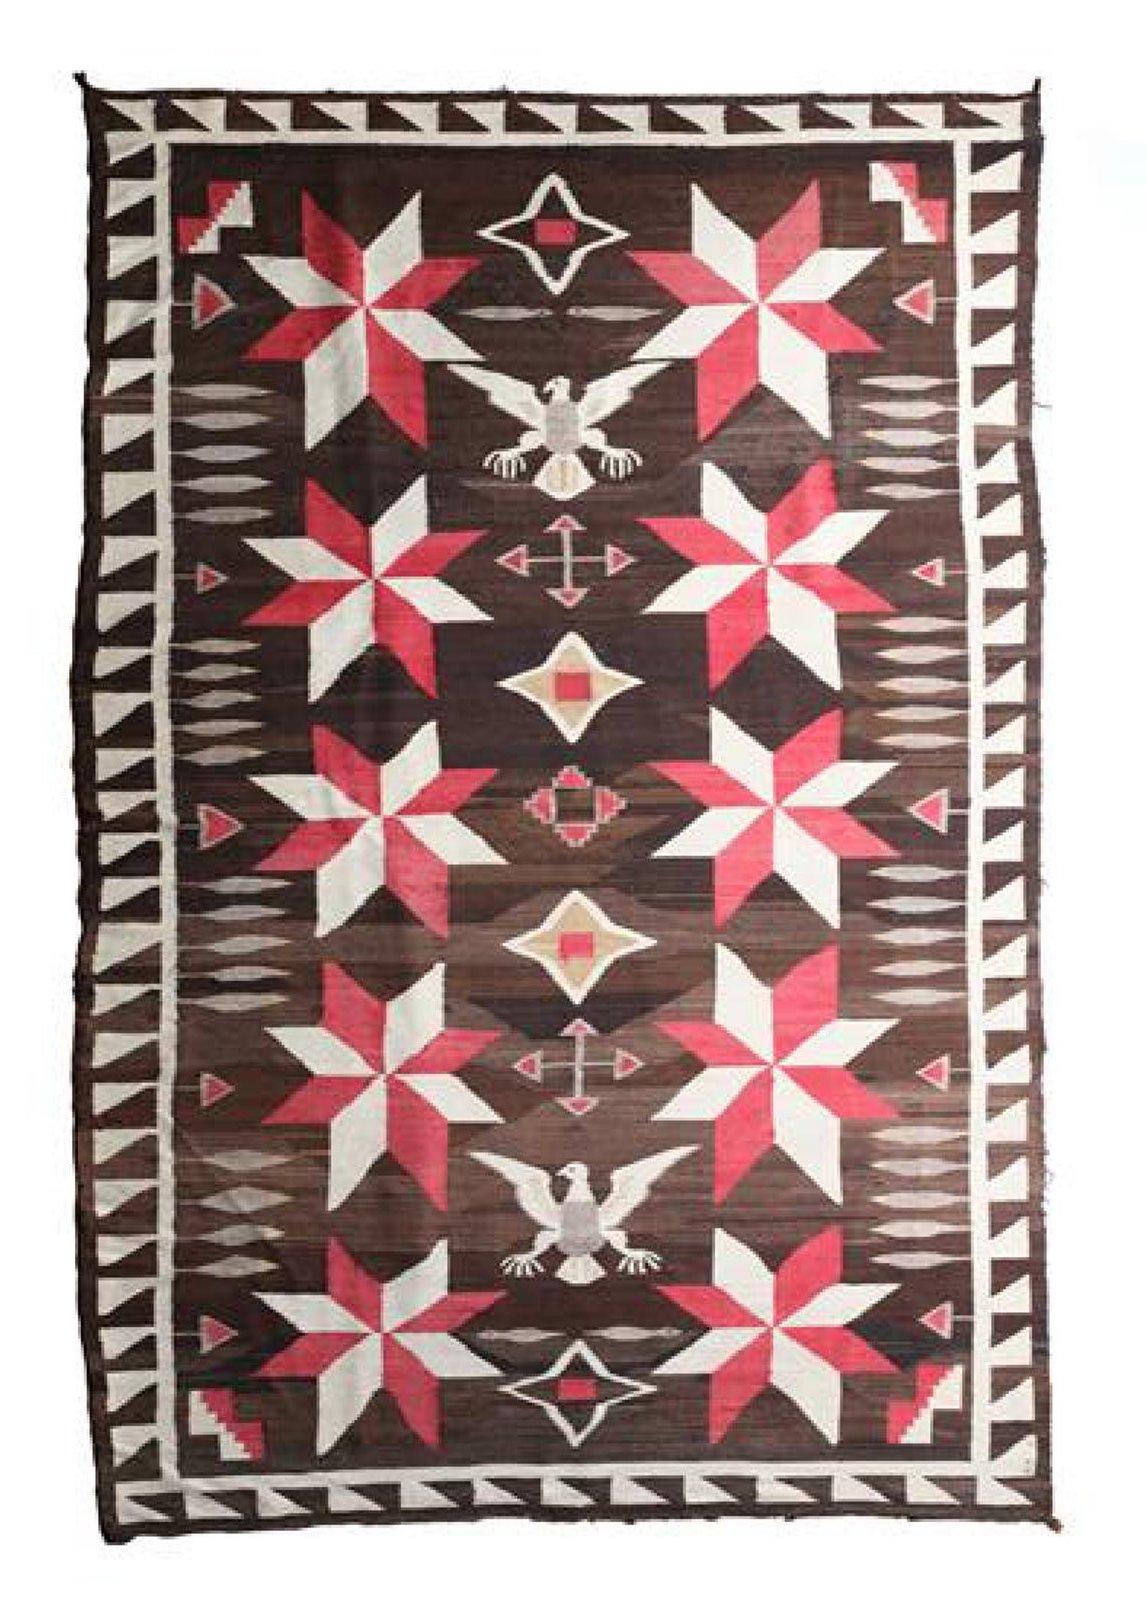 Navajo Crystal pictorial rug